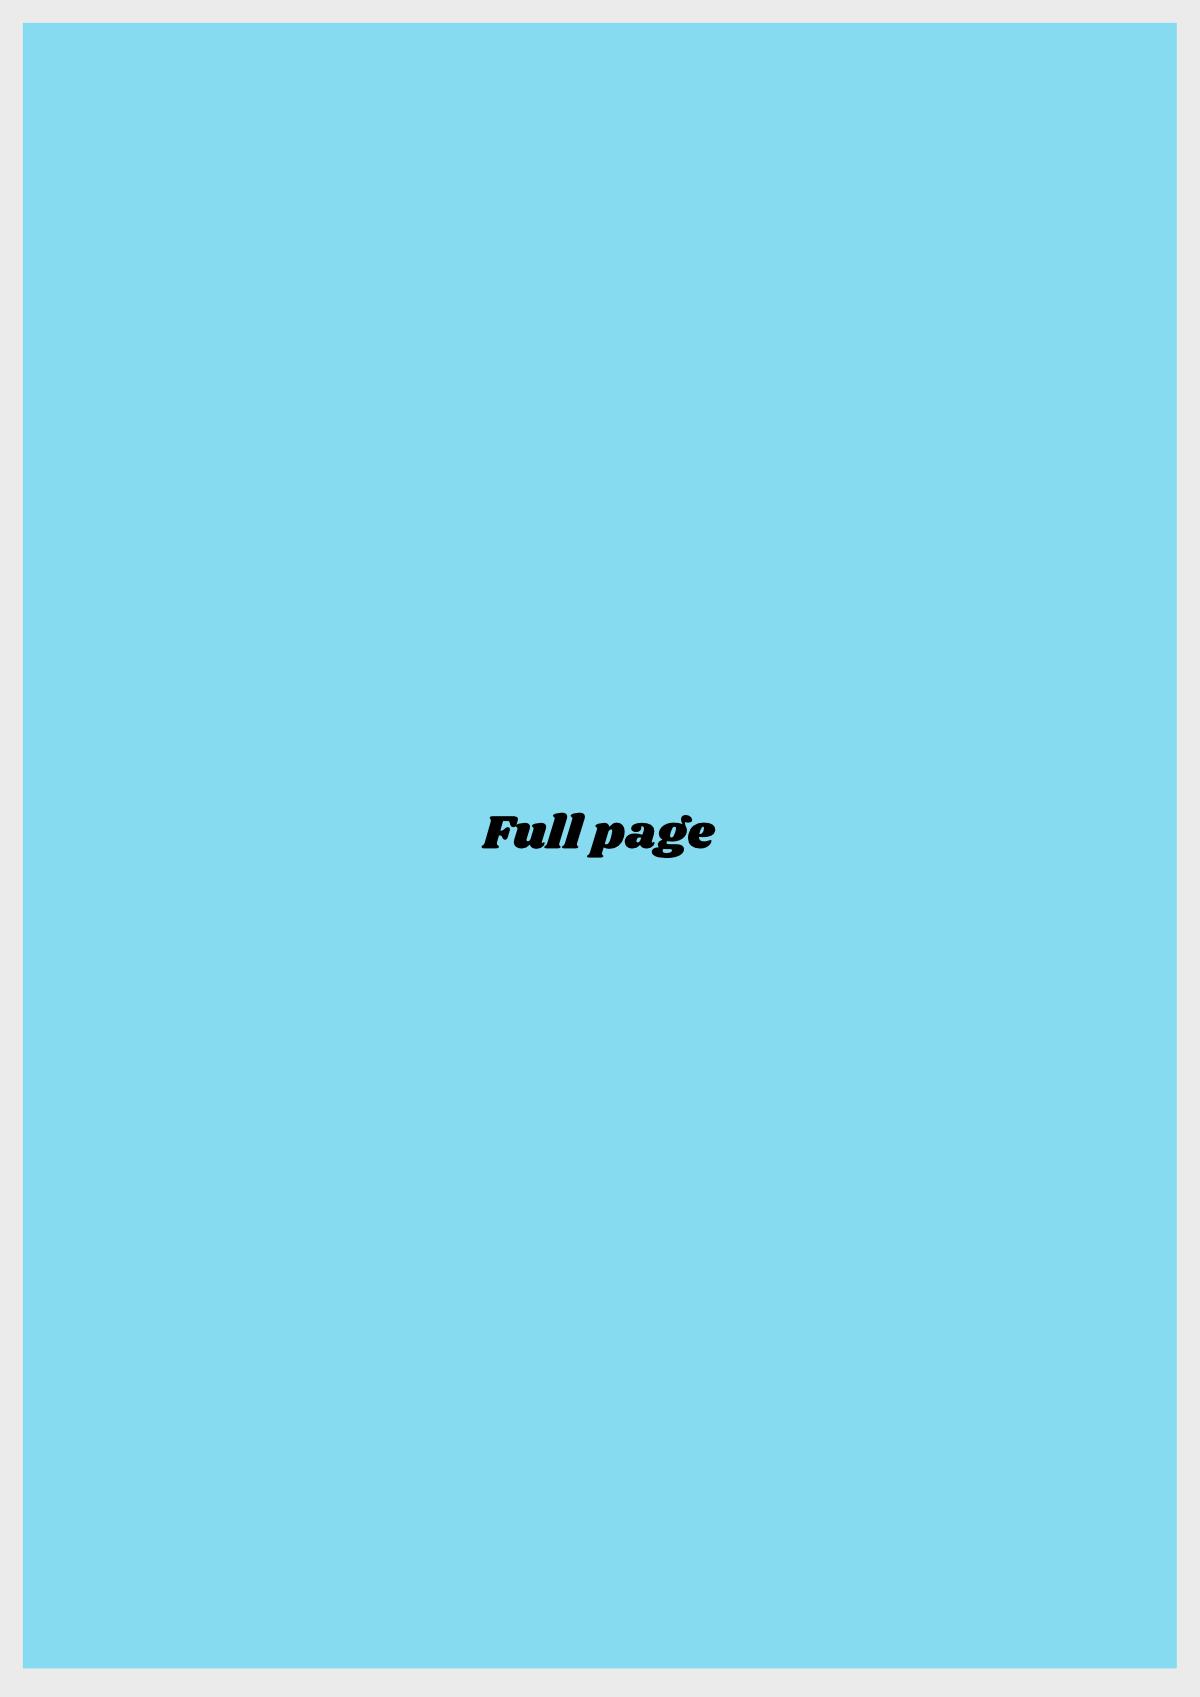 Full page advert thumbnail